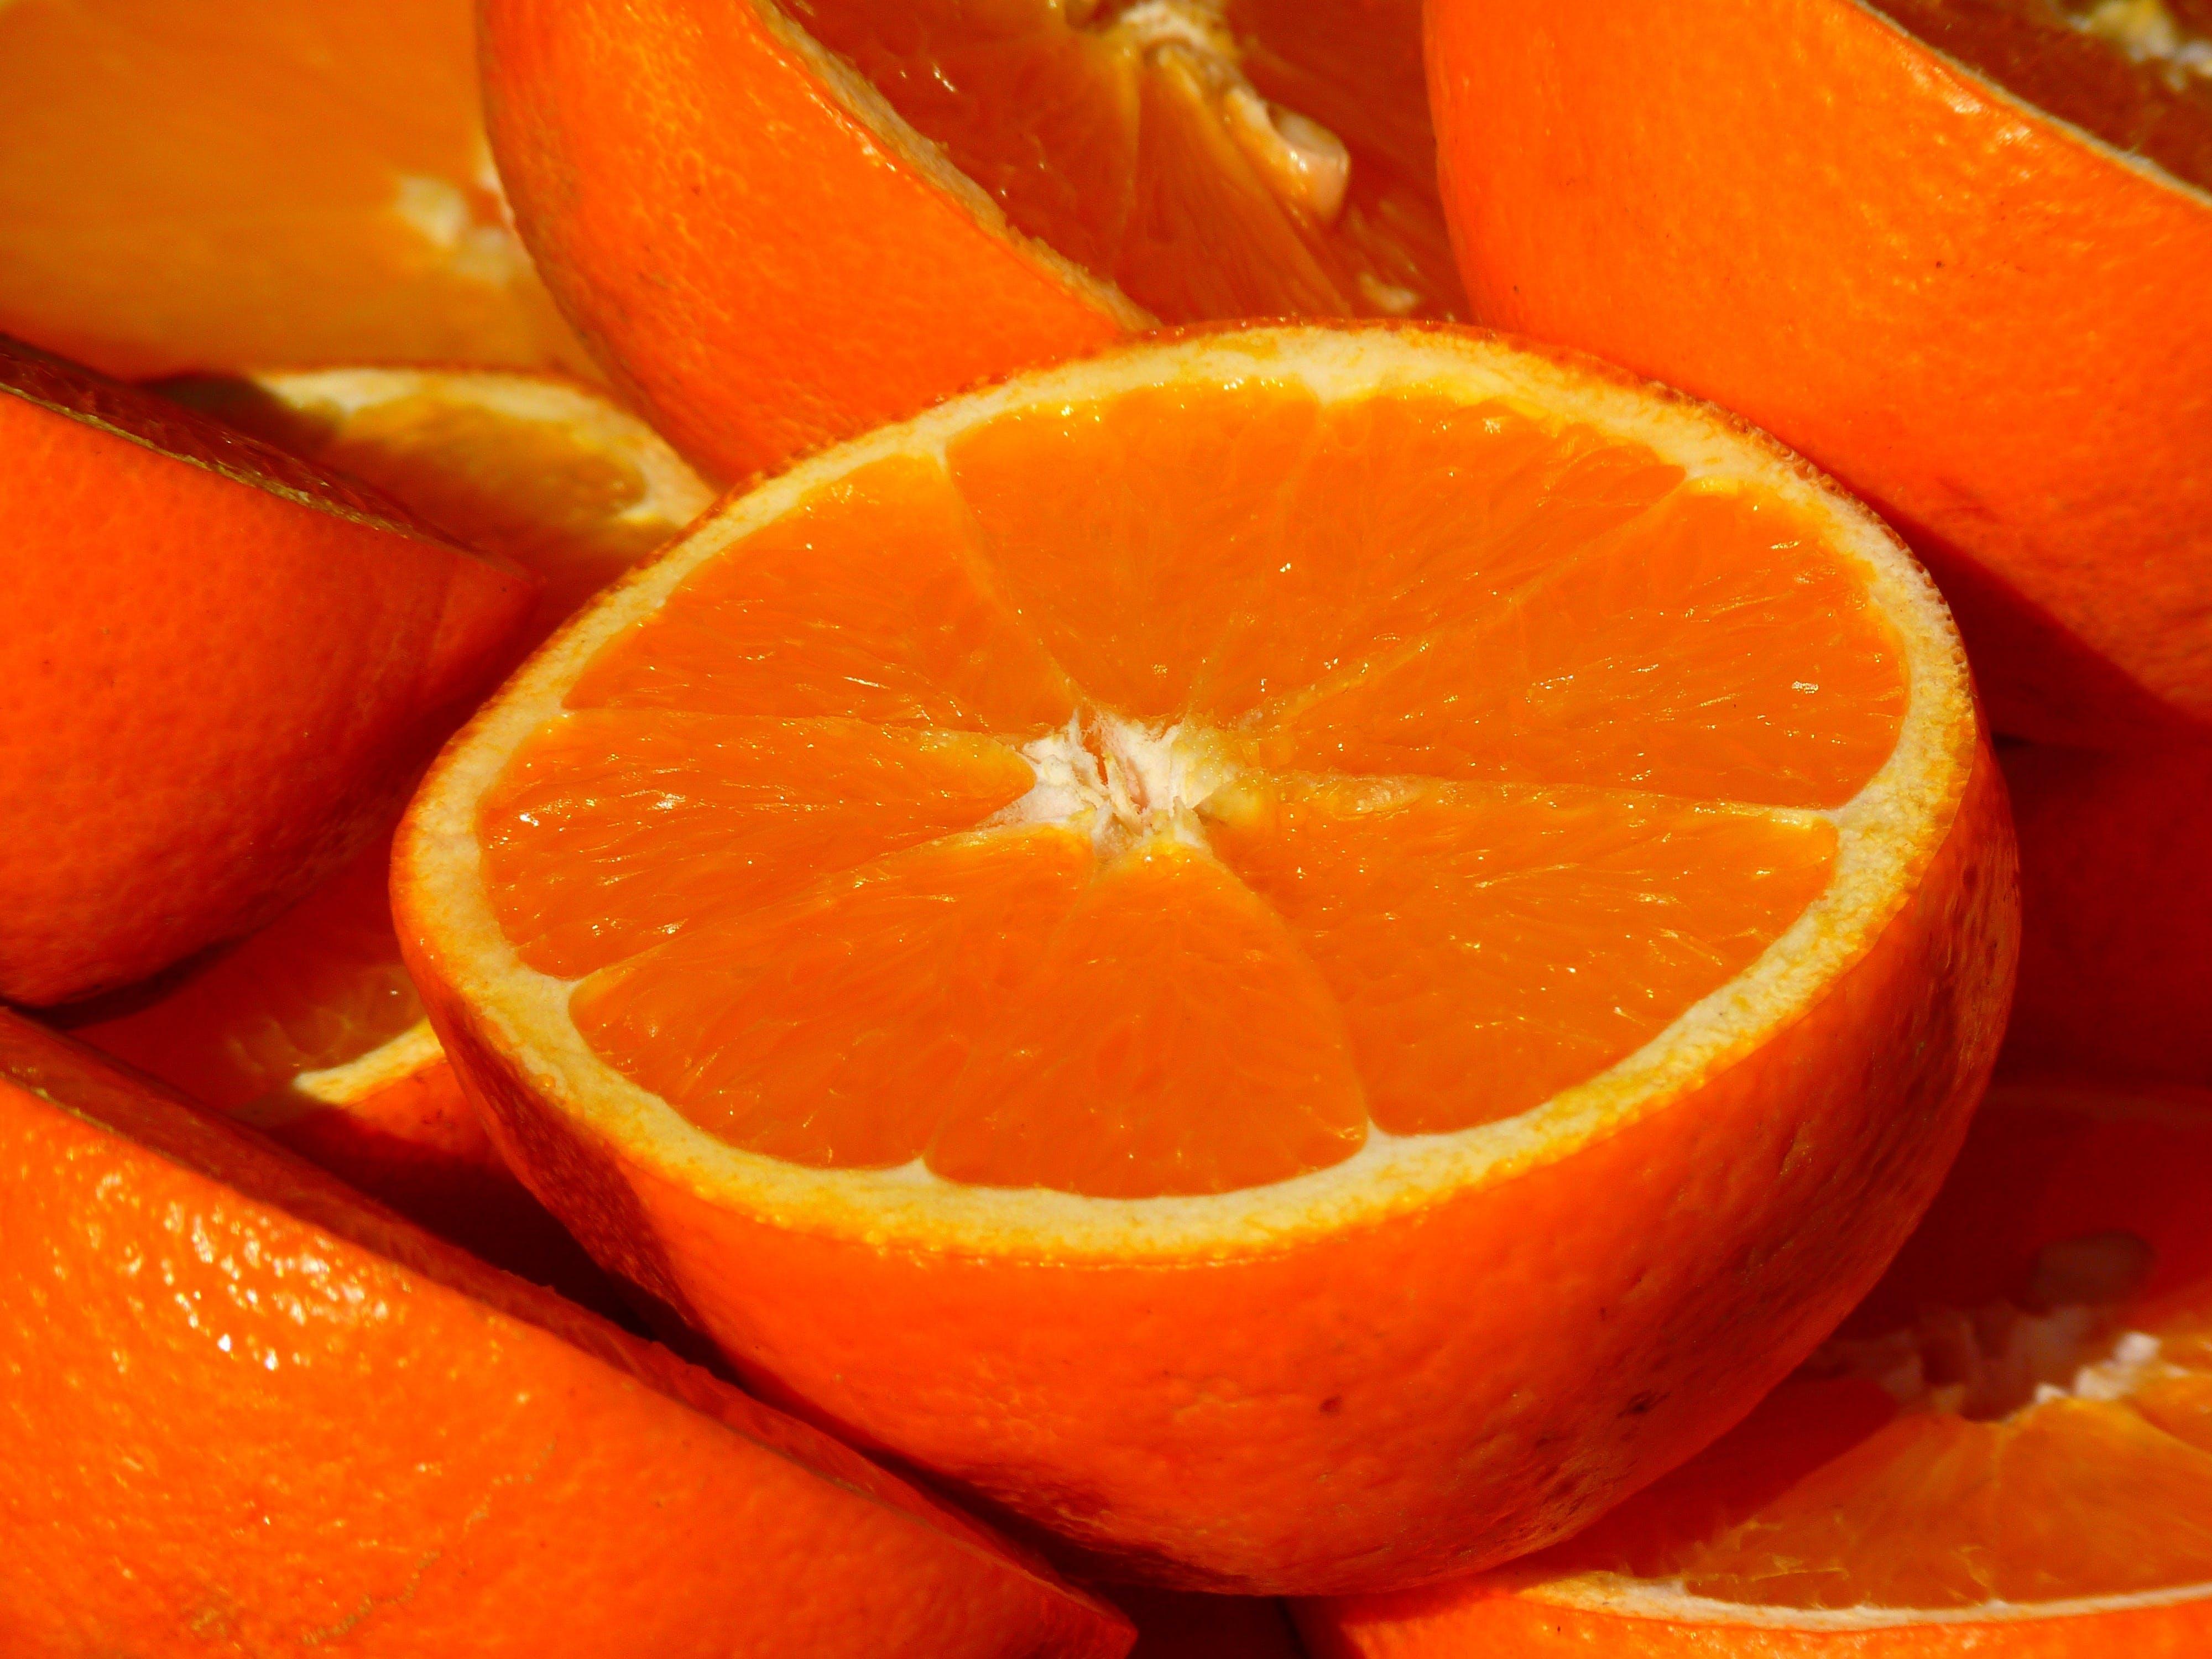 Half Cut Orange Fruit